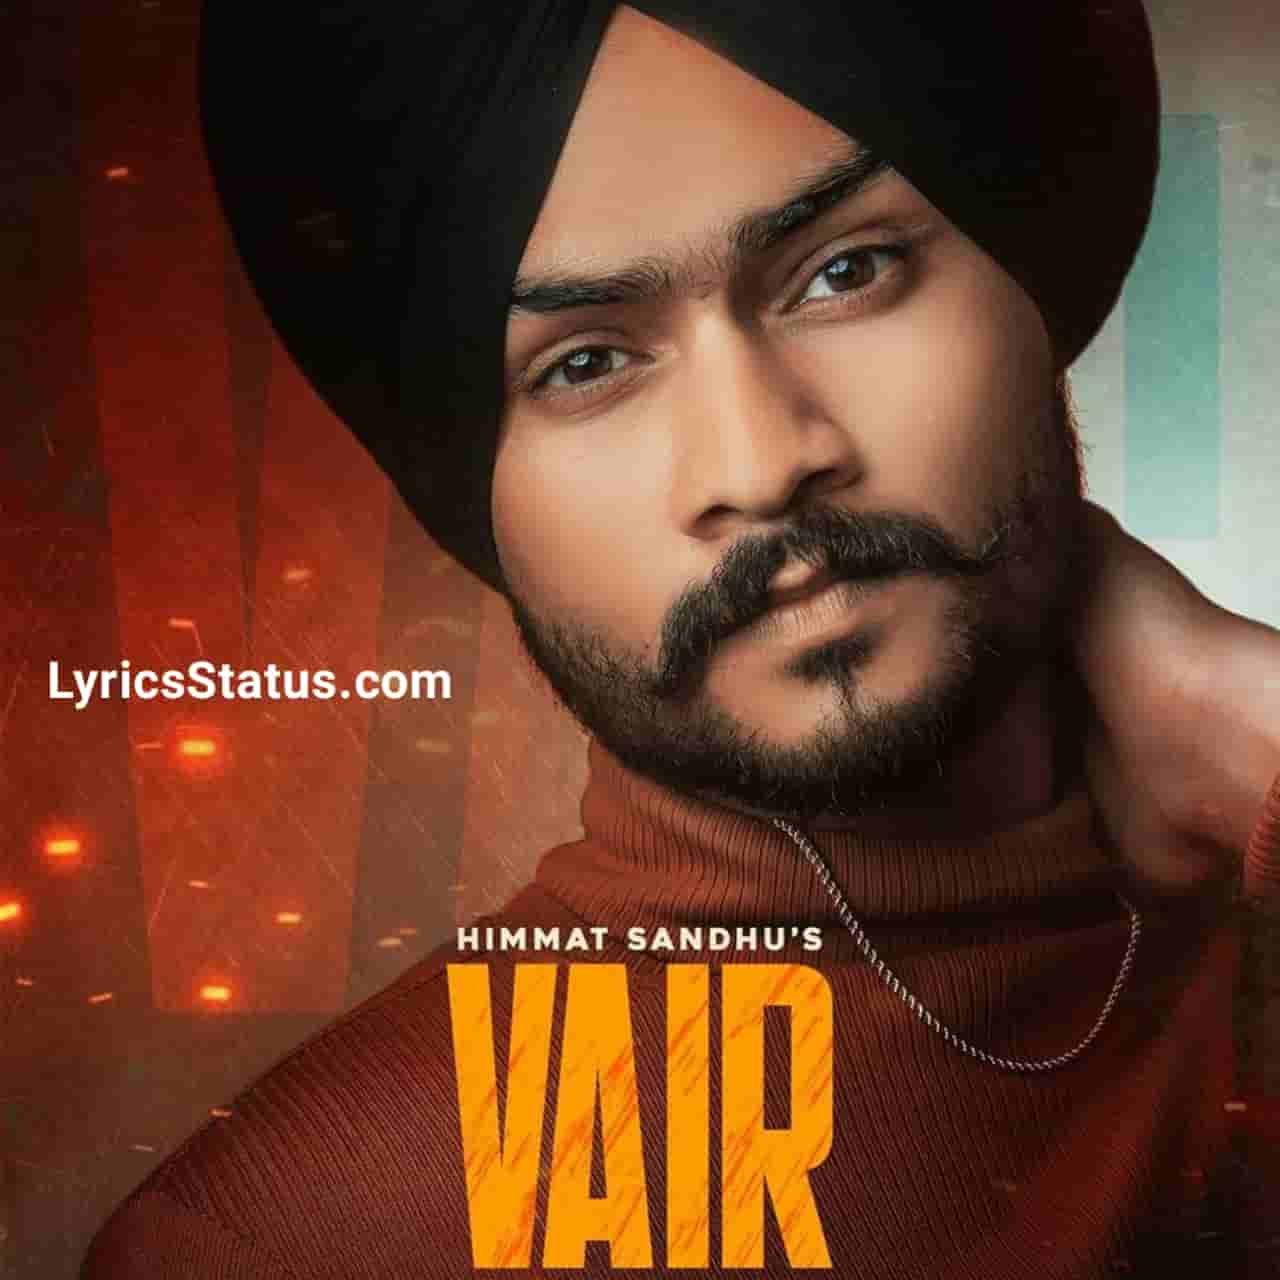 Himmat Sandhu Vair Lyrics Status Download Punjabi Song Jithe Bolde Si Vairi Sir Chadke Laate Bolan Haweliyan Ch Kaa Jatt Nestatus video